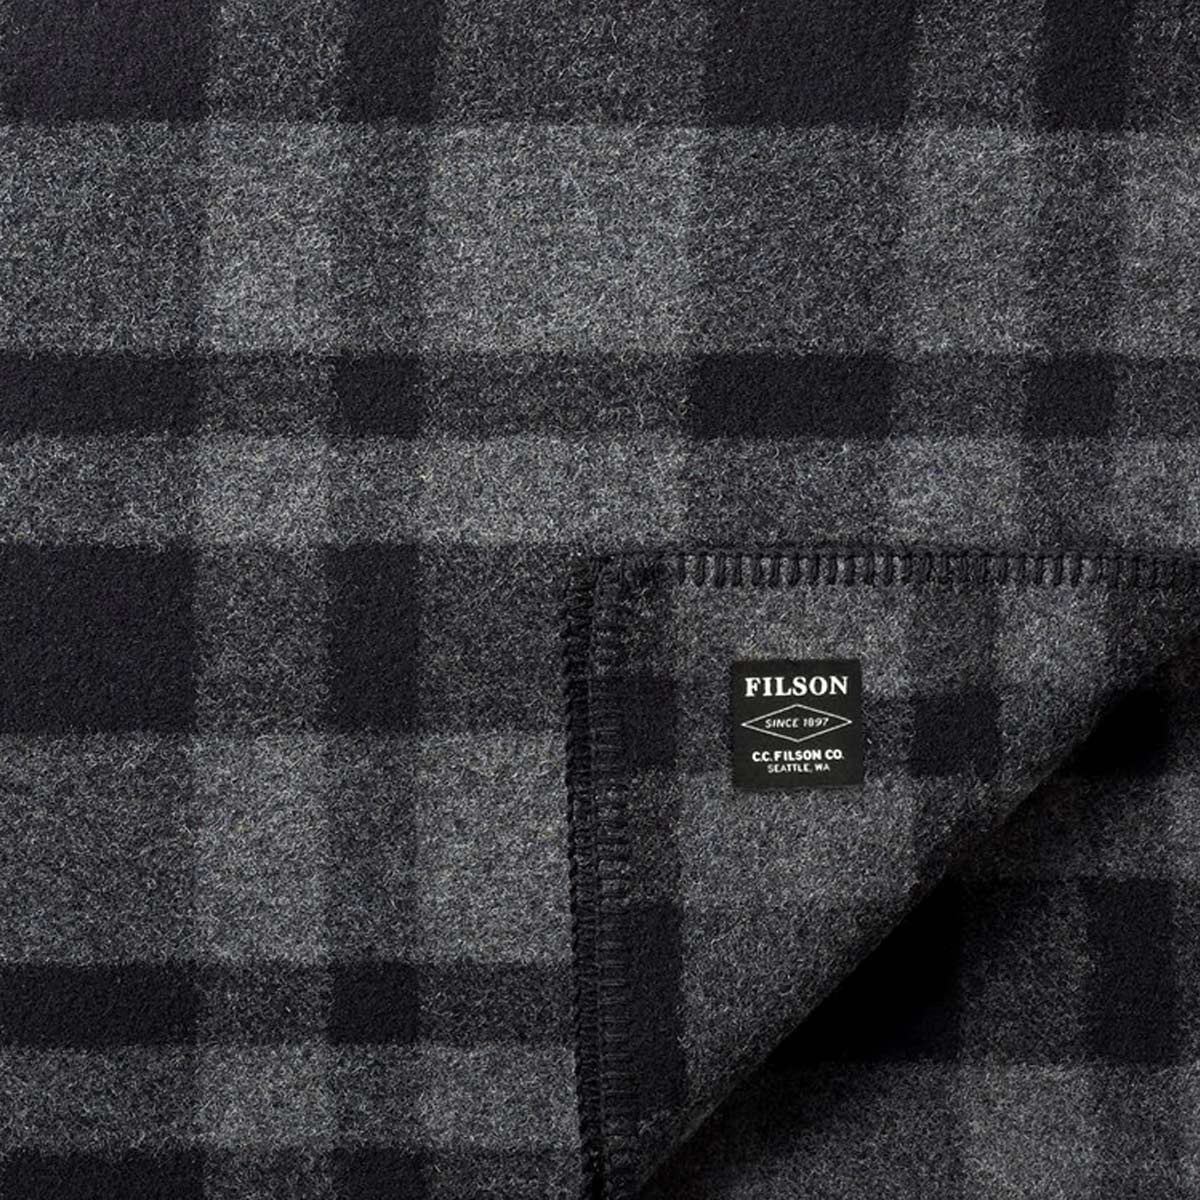 Filson Mackinaw Wool Blanket 11080110-Gray Black, keeps you warm in any weather